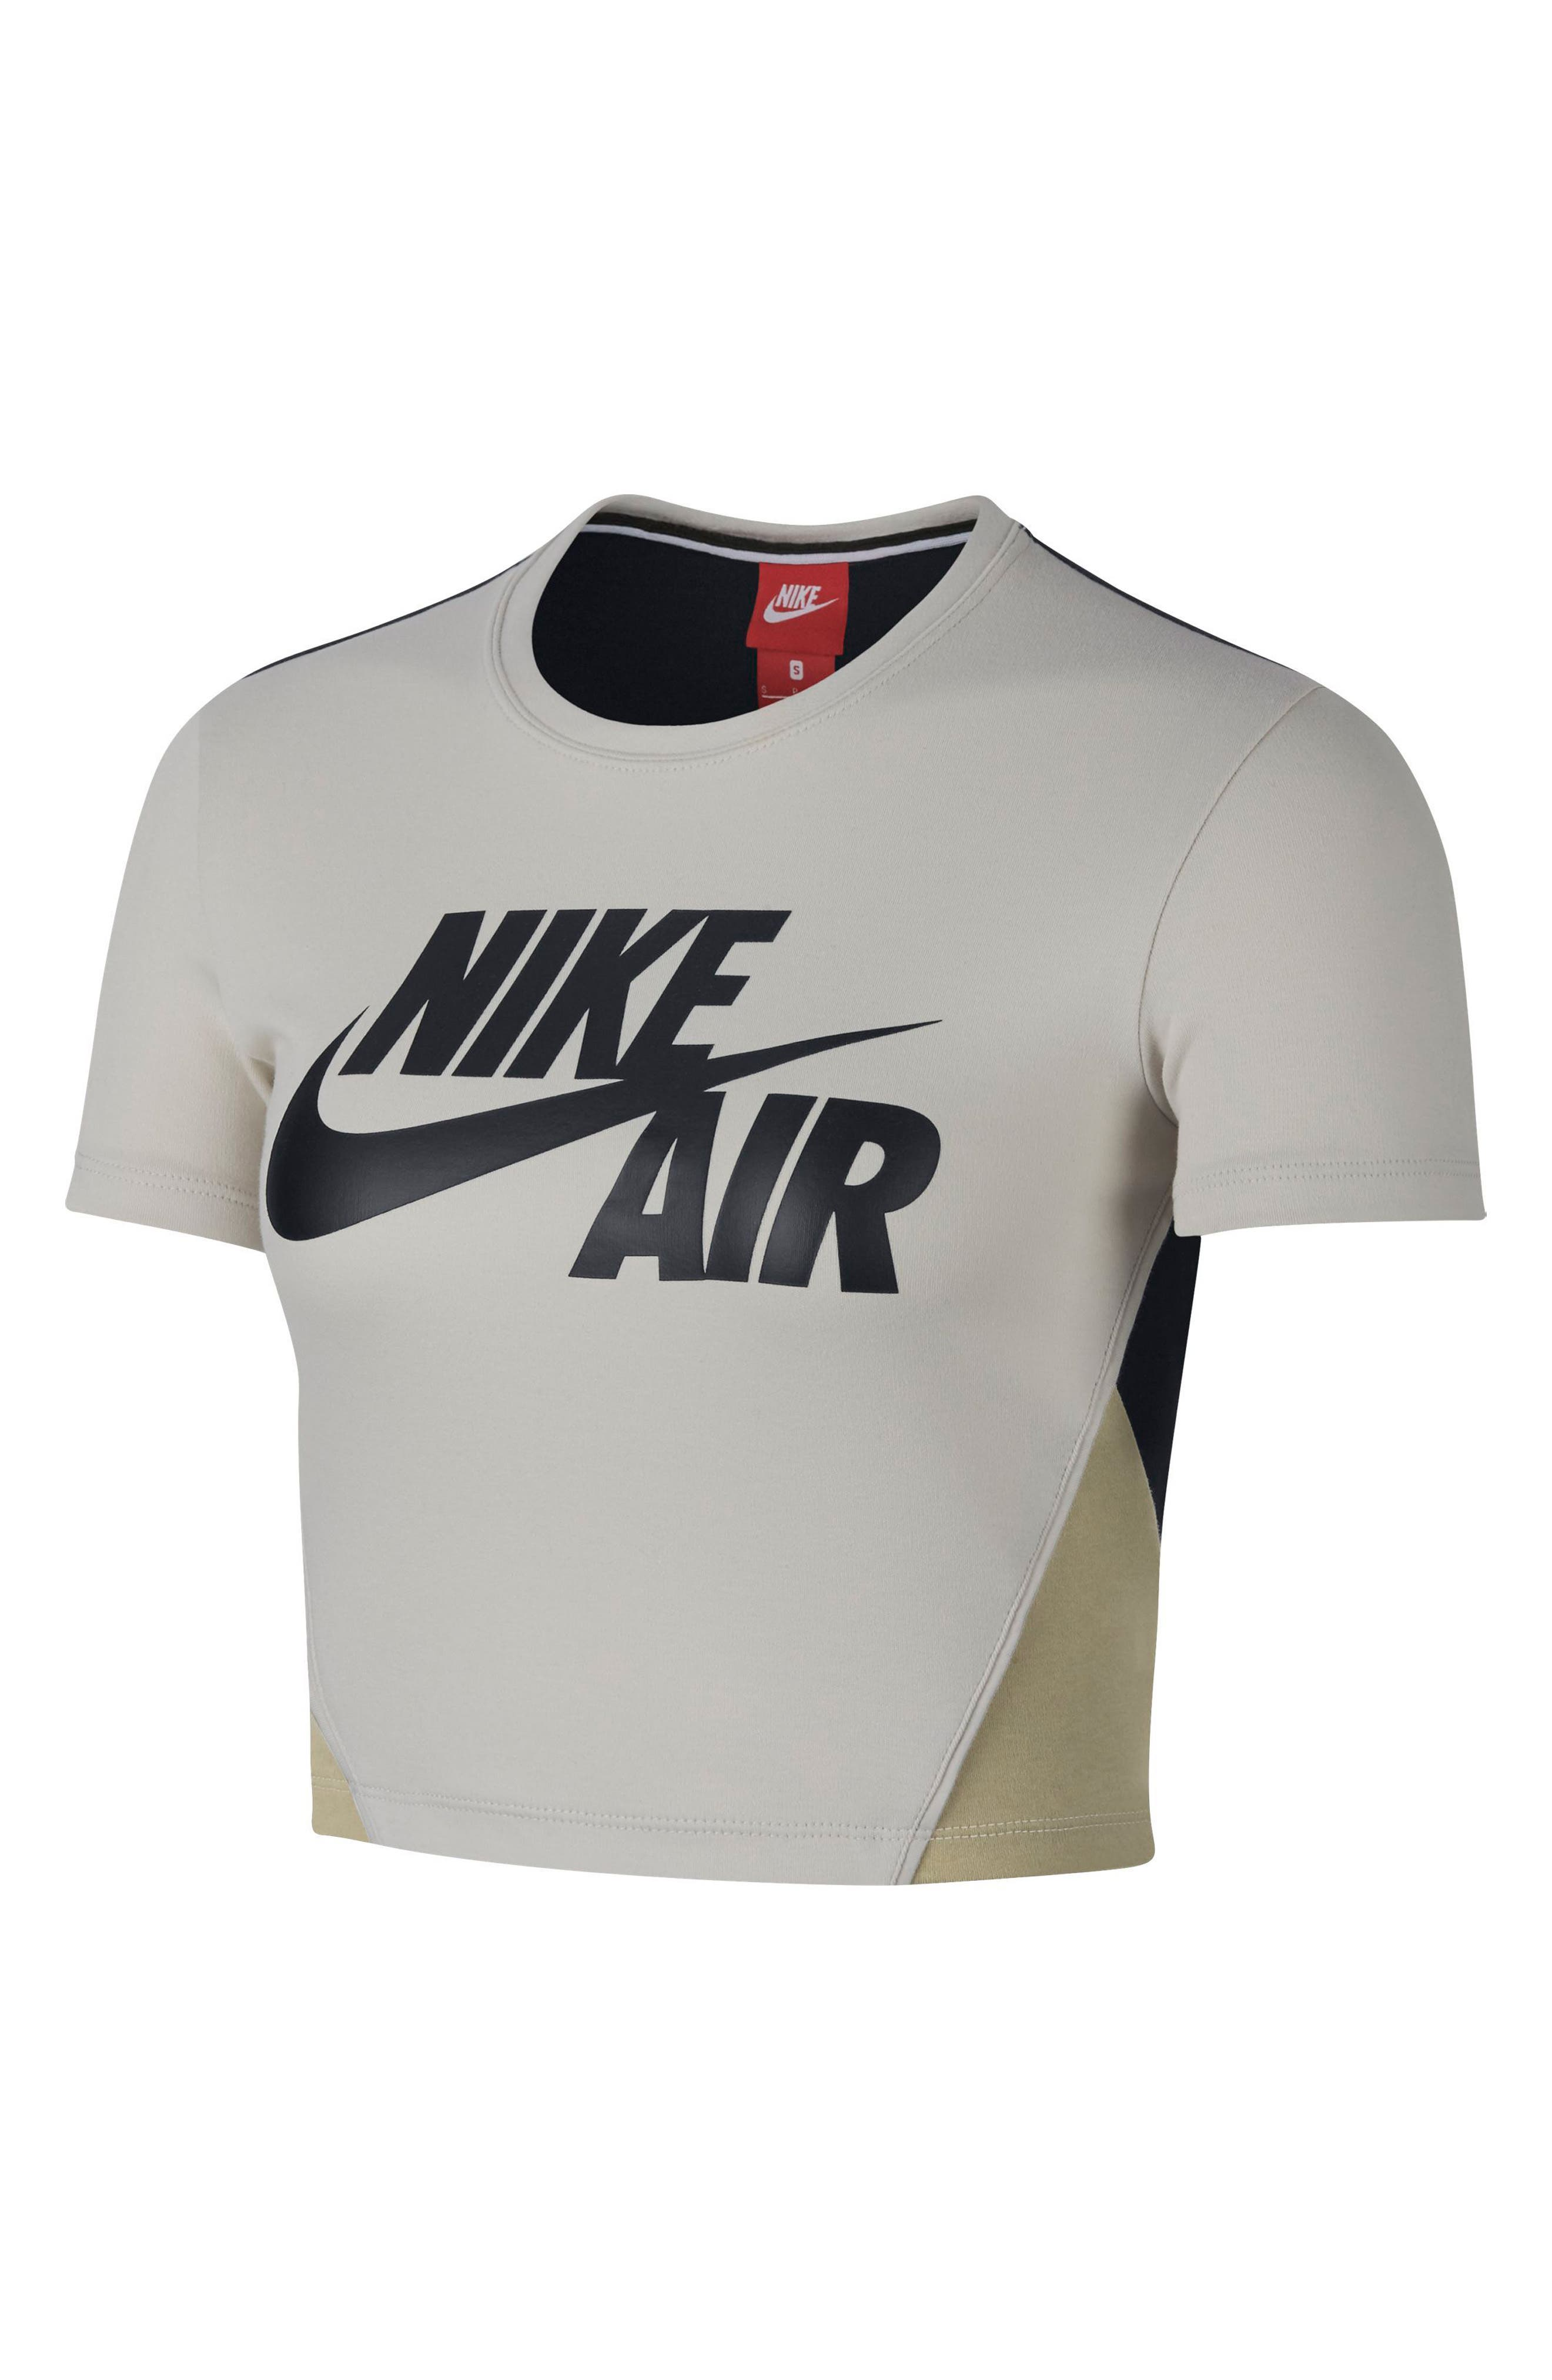 Sportswear Stretch Jersey Crop Top,                             Main thumbnail 1, color,                             LIGHT BONE/BLACK/NEUTRAL OLIVE